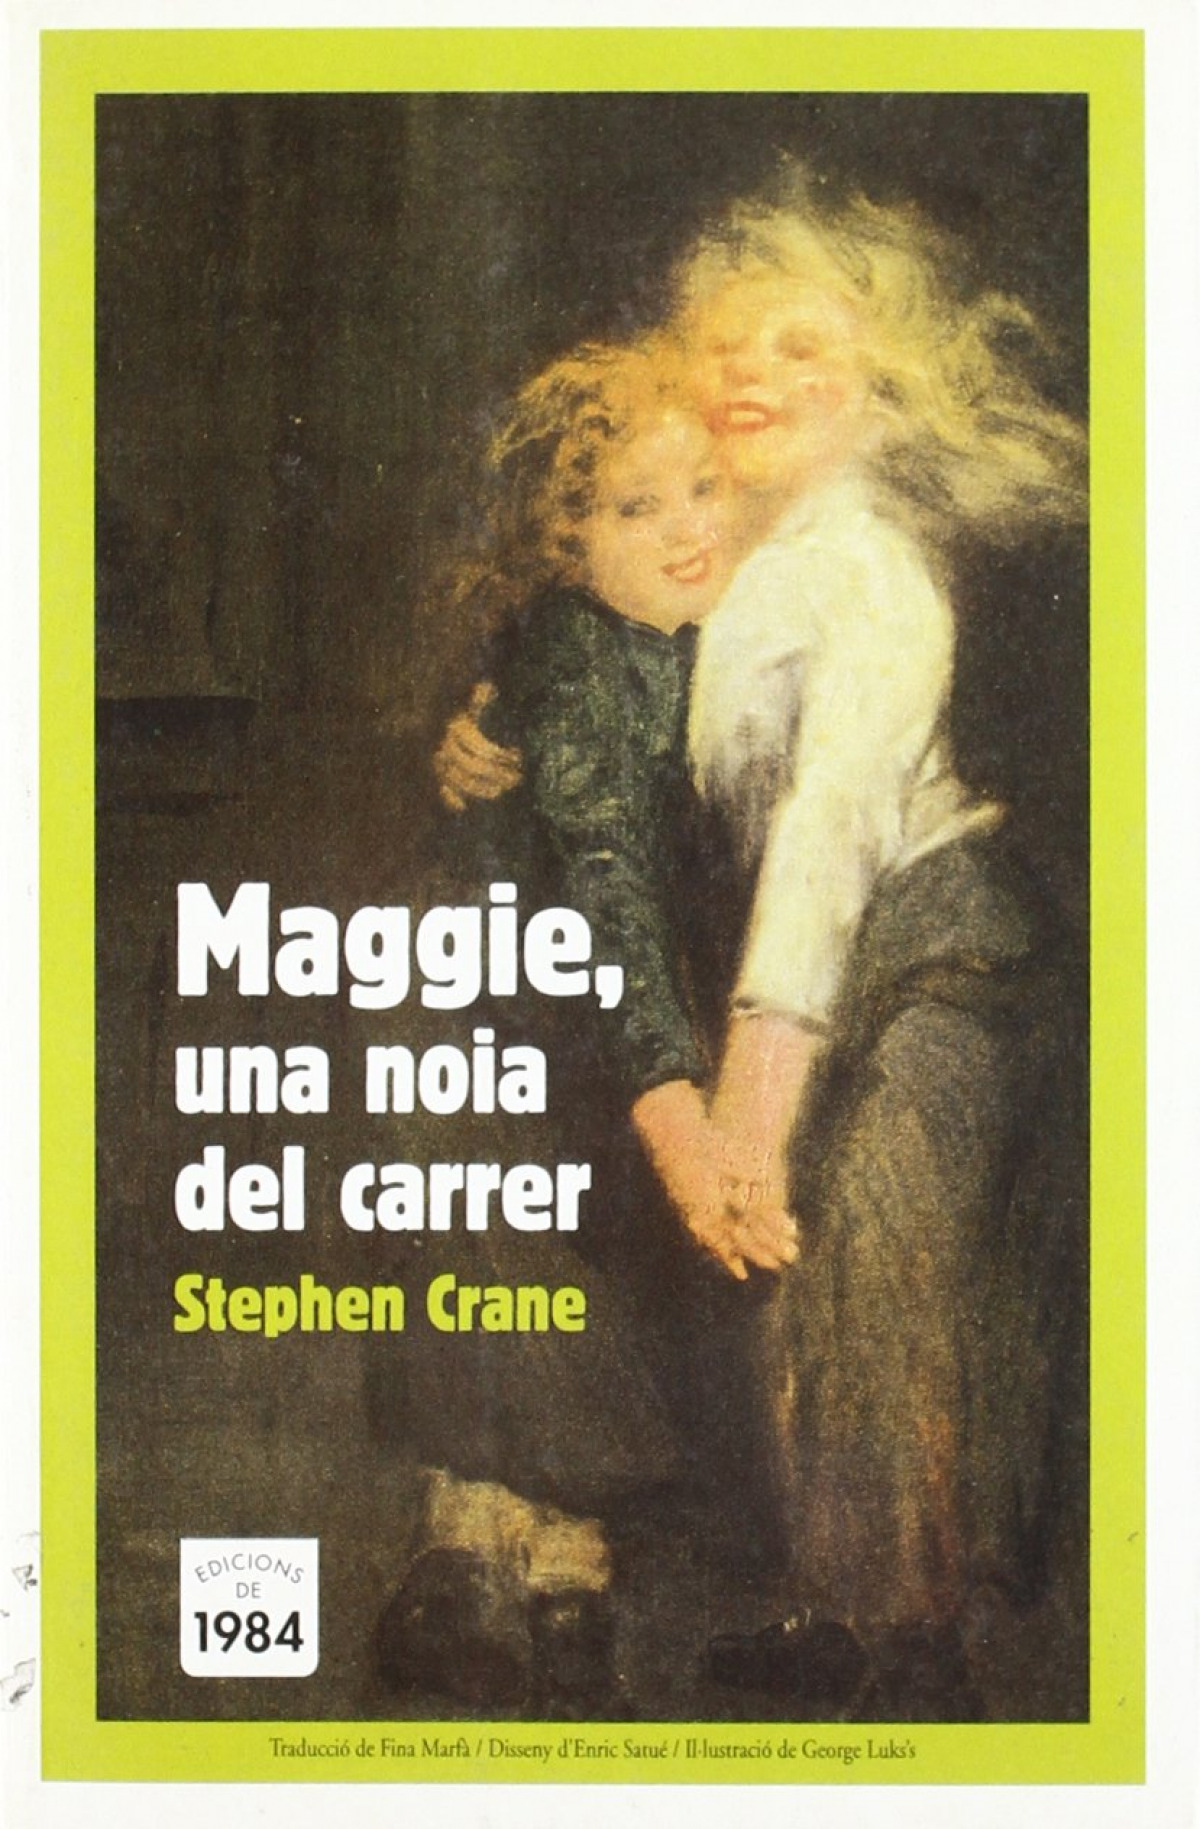 Maggie, una noia del carrer